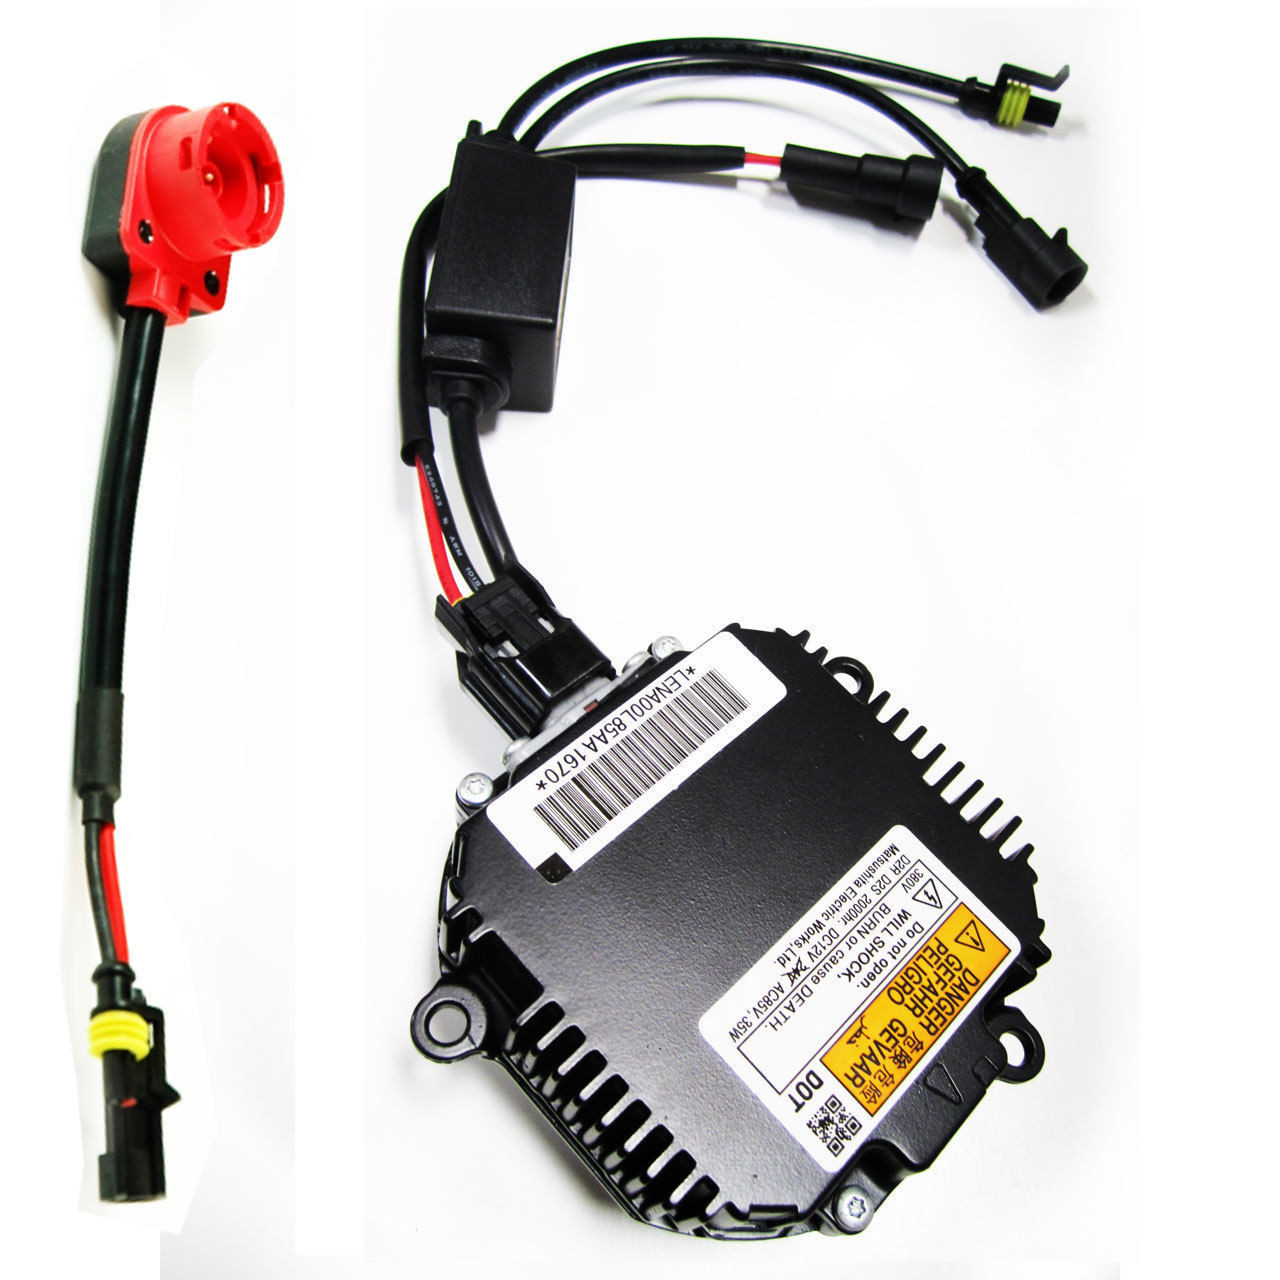 Ballast Hid Xenon Headlight D2s D2r Oem Style For Nissan & Infiniti M35 Oem  Hid Ballast Schematic